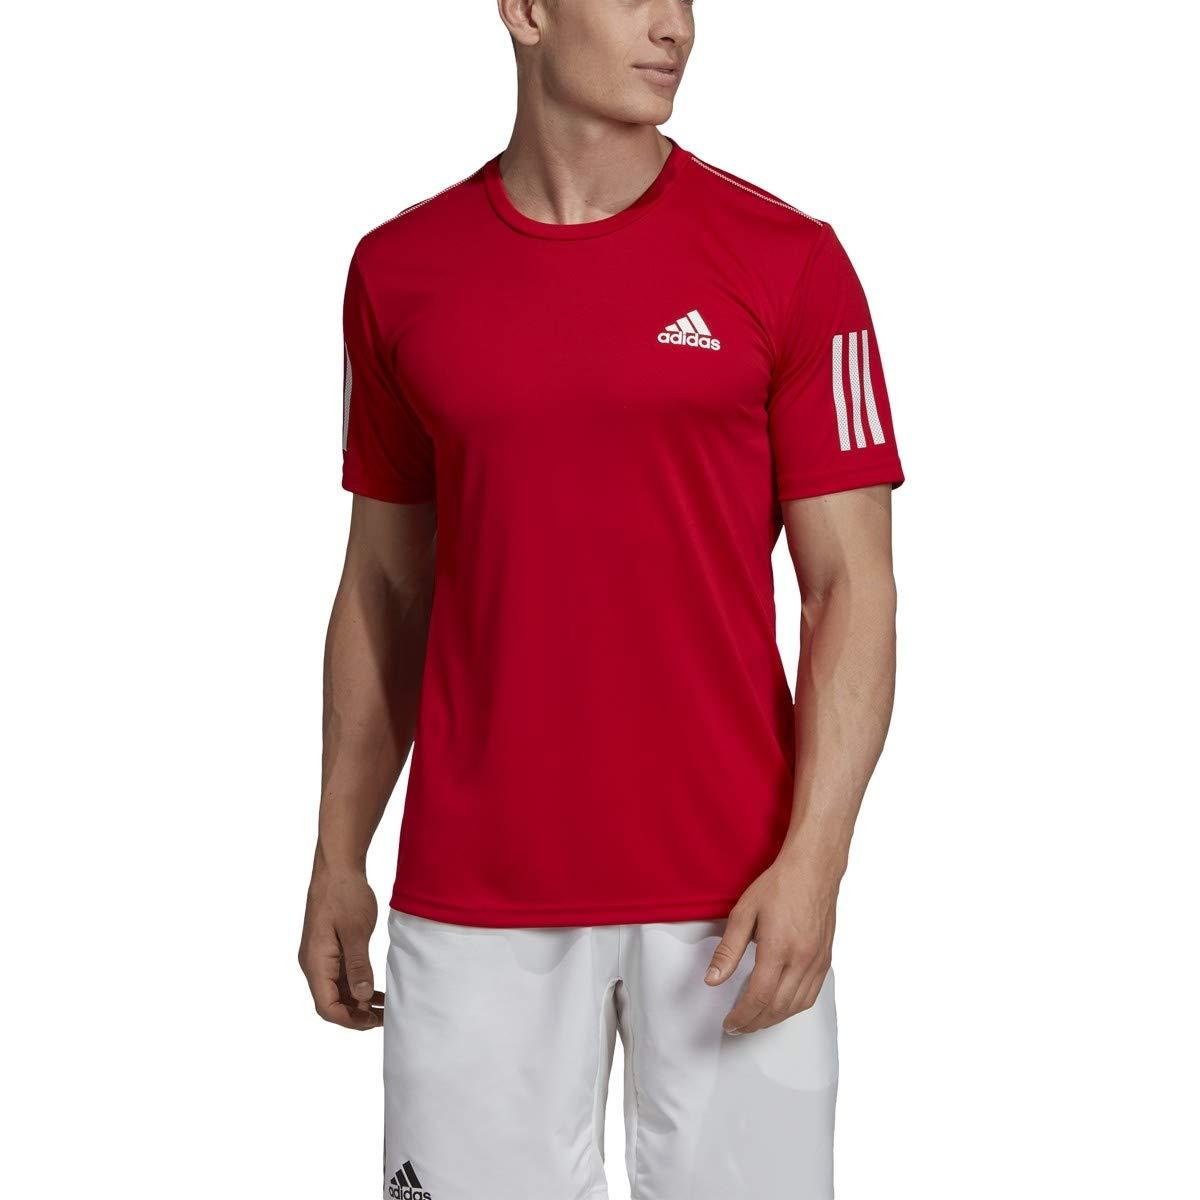 adidas Men's 3-Stripes Club Tennis Tee, Scarlet, X-Small